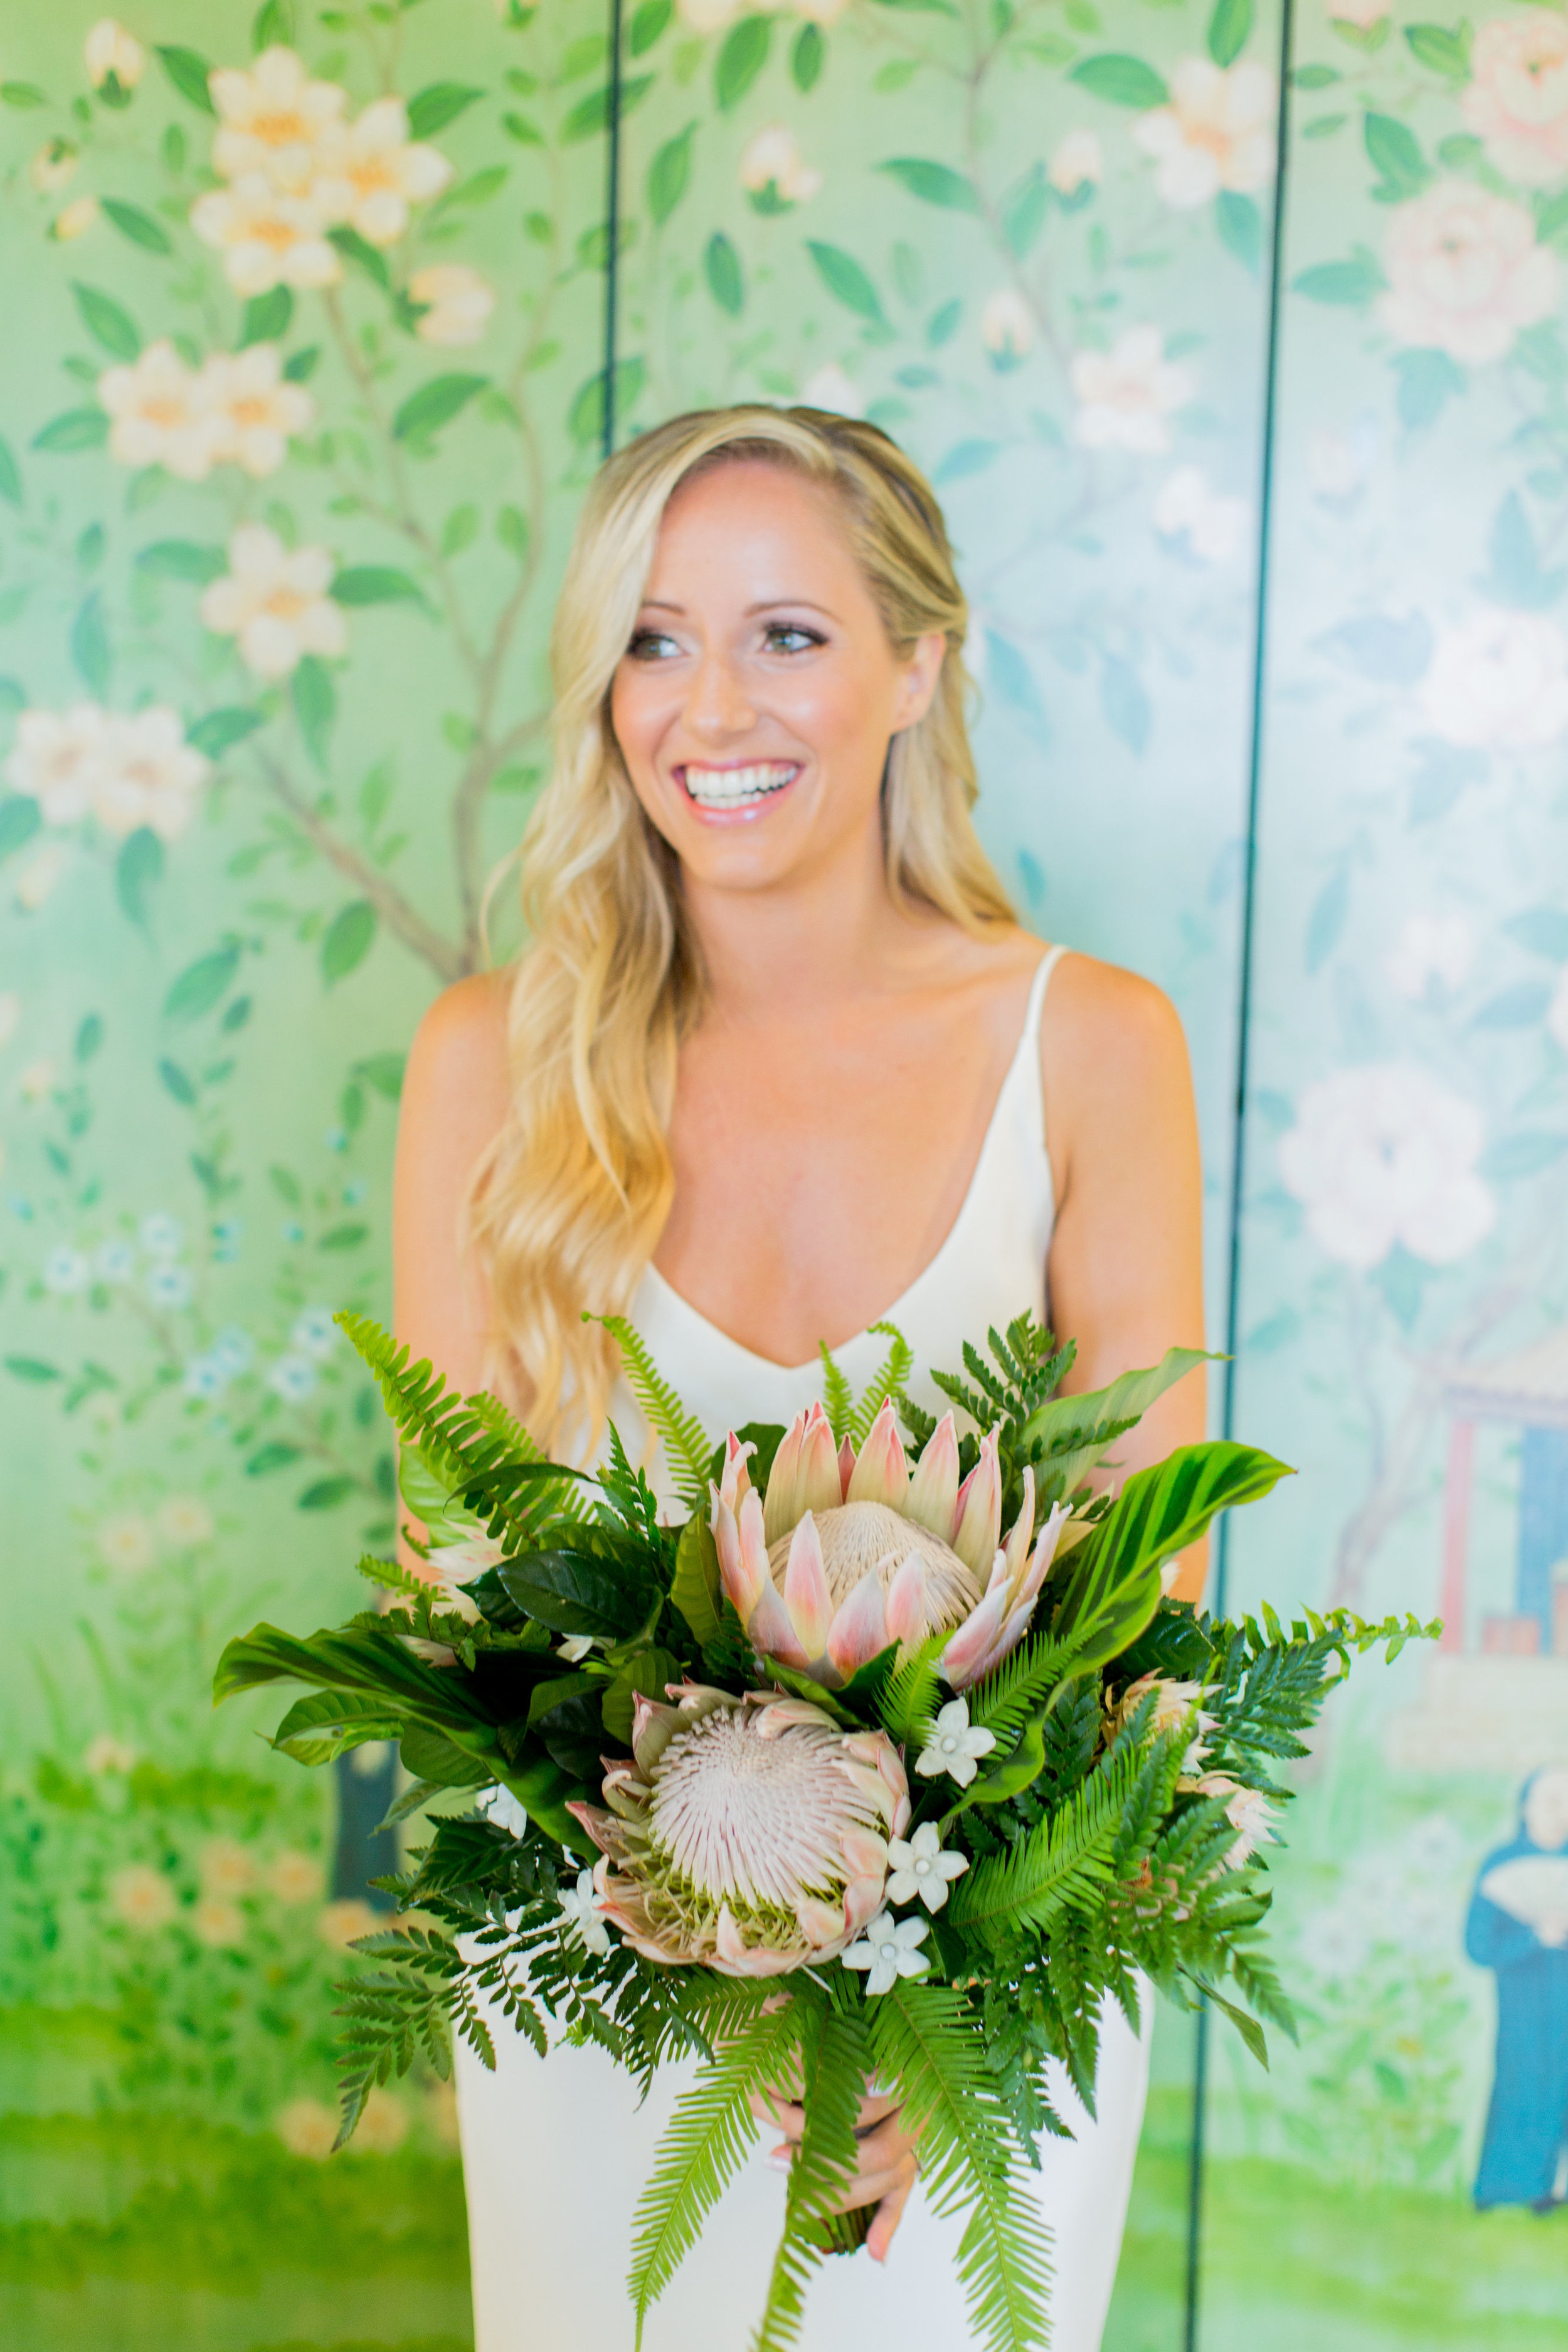 www.santabarbarawedding.com   Santa Barbara Zoo   Wonder Tribe   Events by Rincon   Bridal Bouquet   Bride